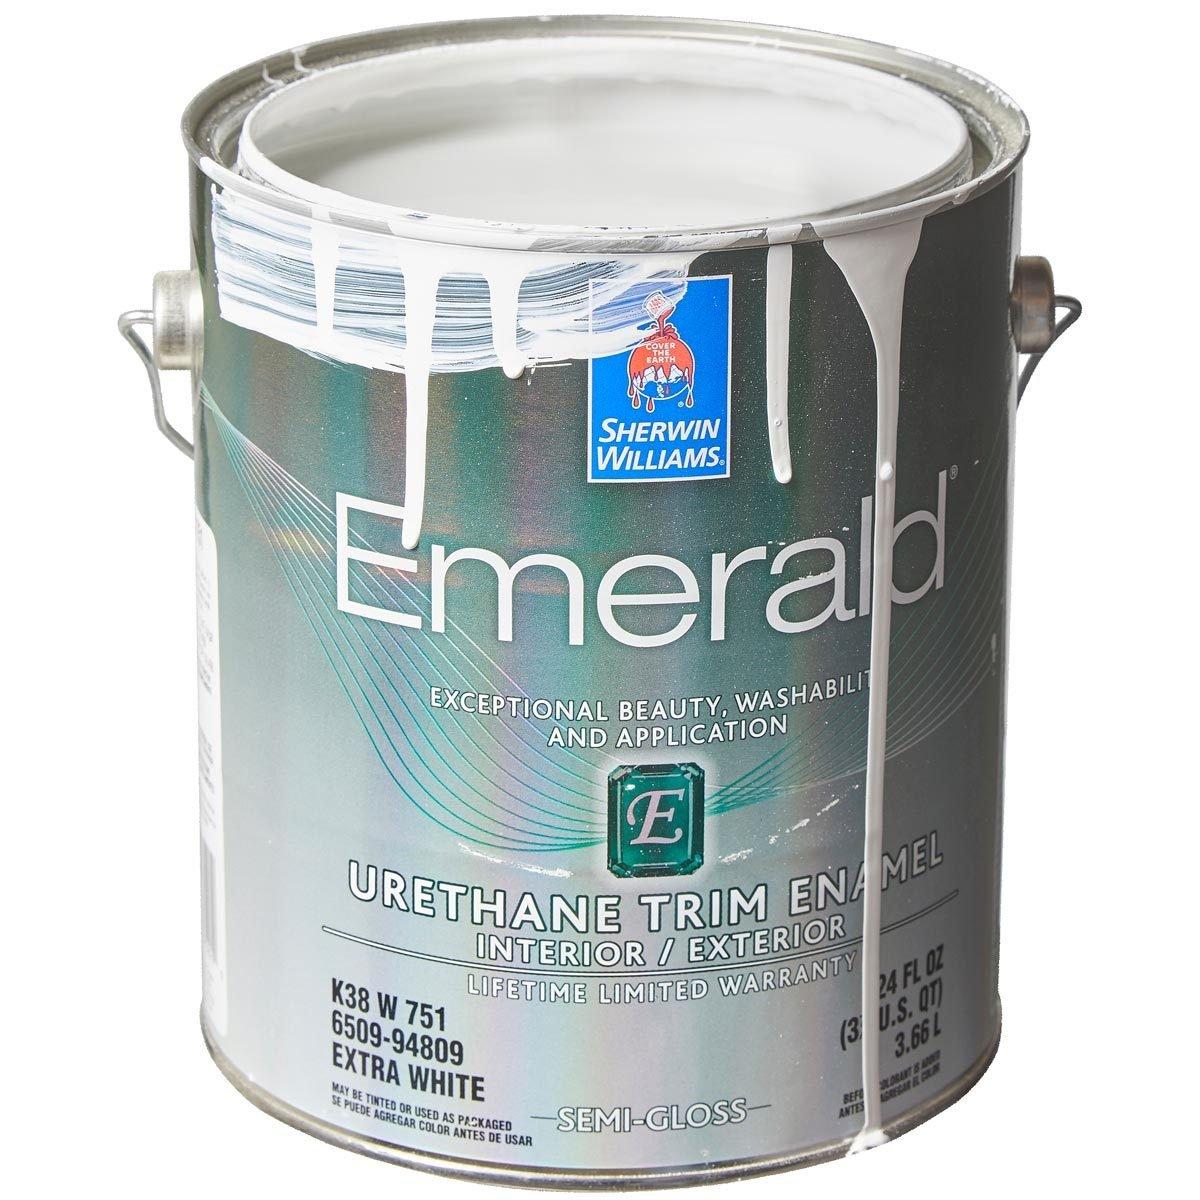 SHERWIN-WILLIAMS EMERALD URETHANE TRIM ENAMEL trim paint